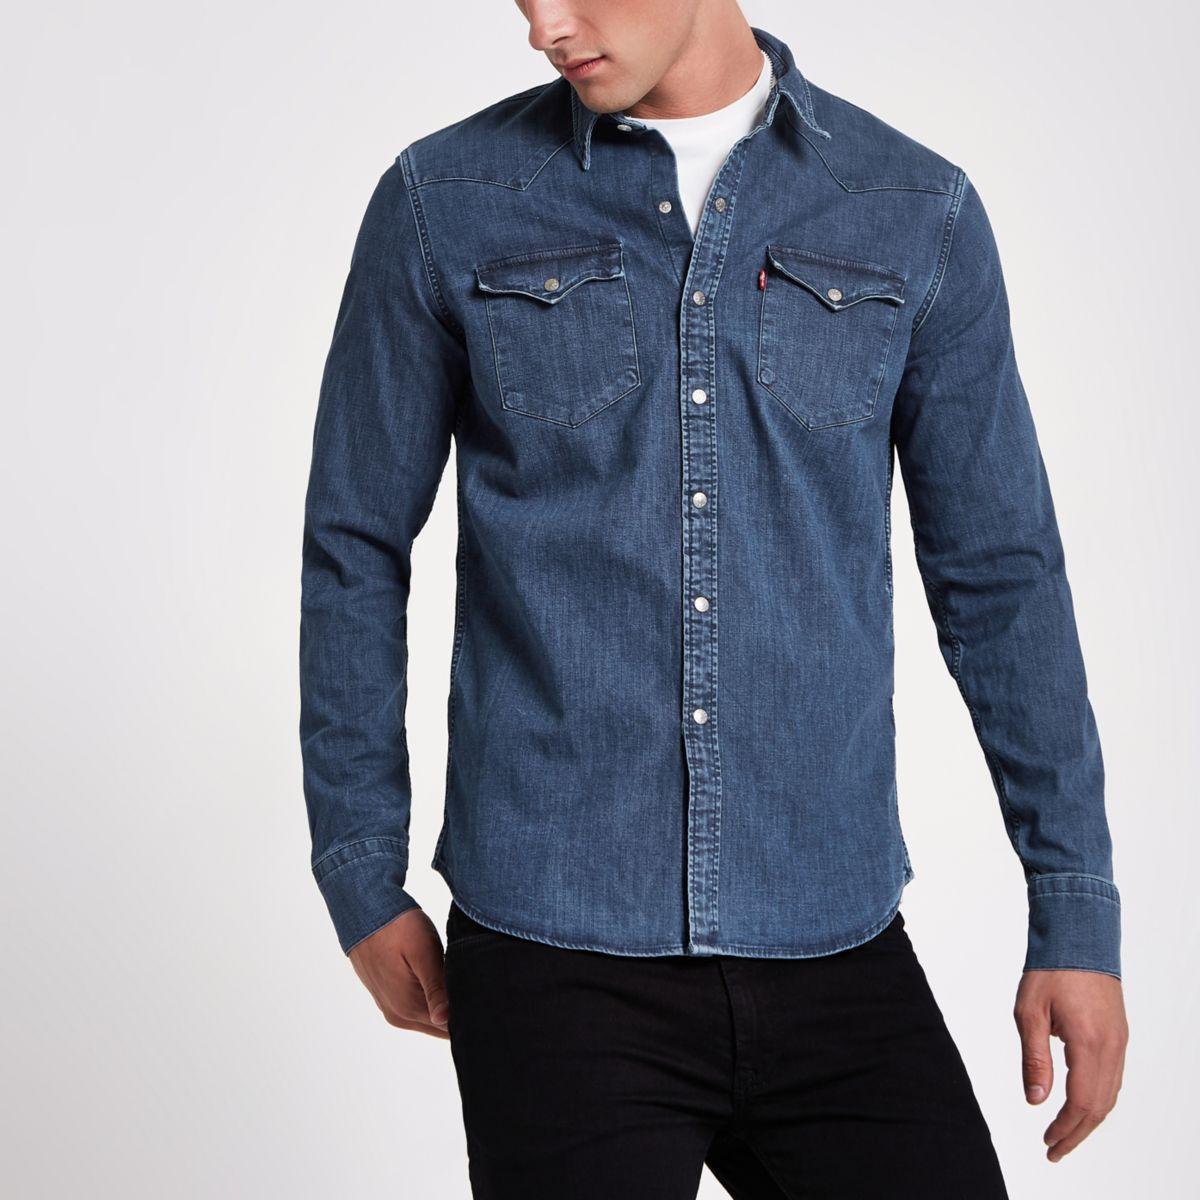 Levi's blue denim western shirt